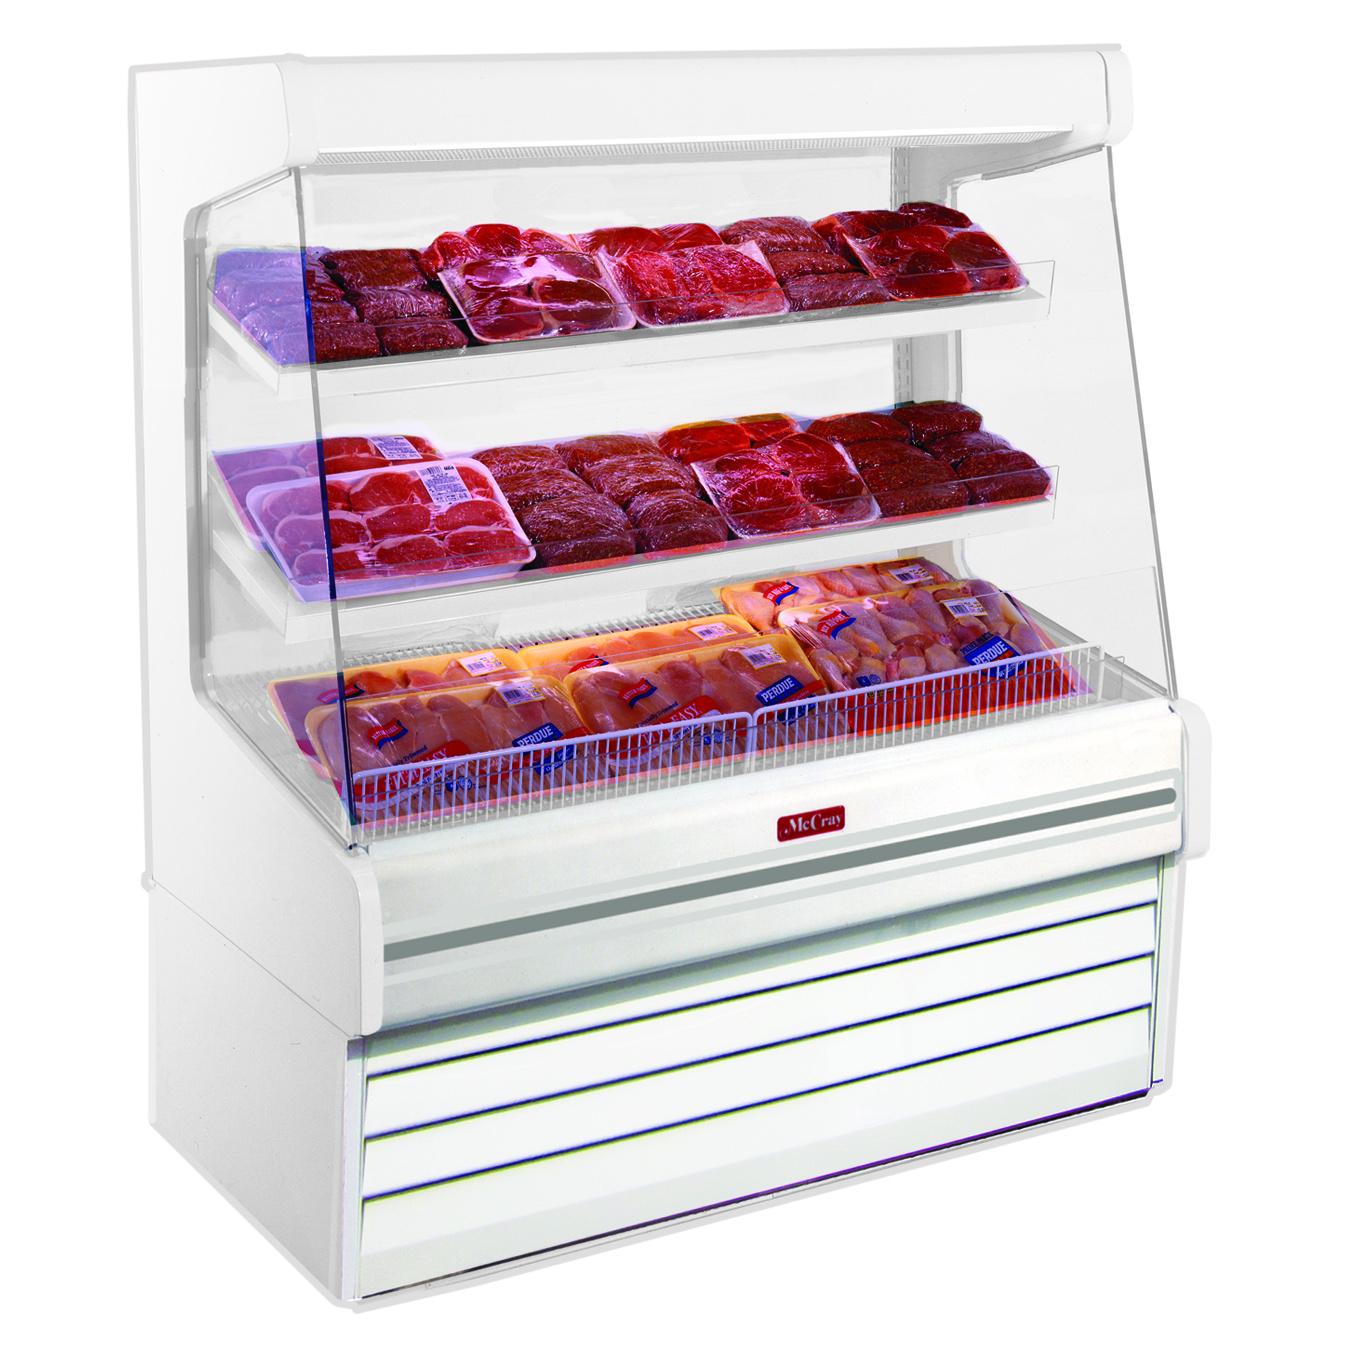 Howard-McCray SC-OP30E-3L-S-LED display case, produce